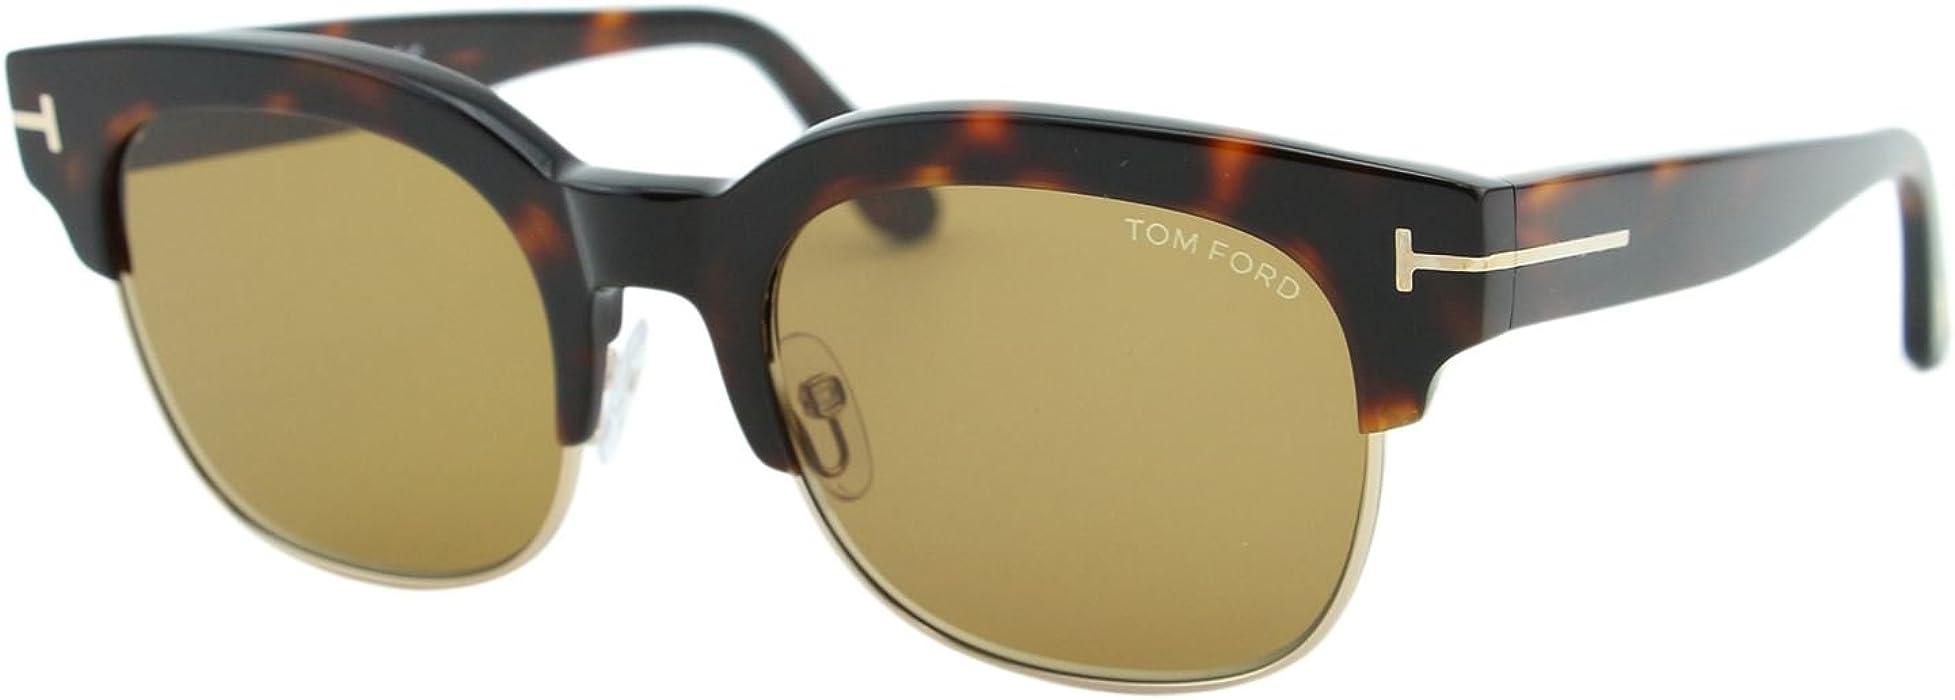 31db9df703 2018 Tom Ford Harry-02 FT0597 56E Men Tortoise Gold T Clubmaster Square  Sunglasses